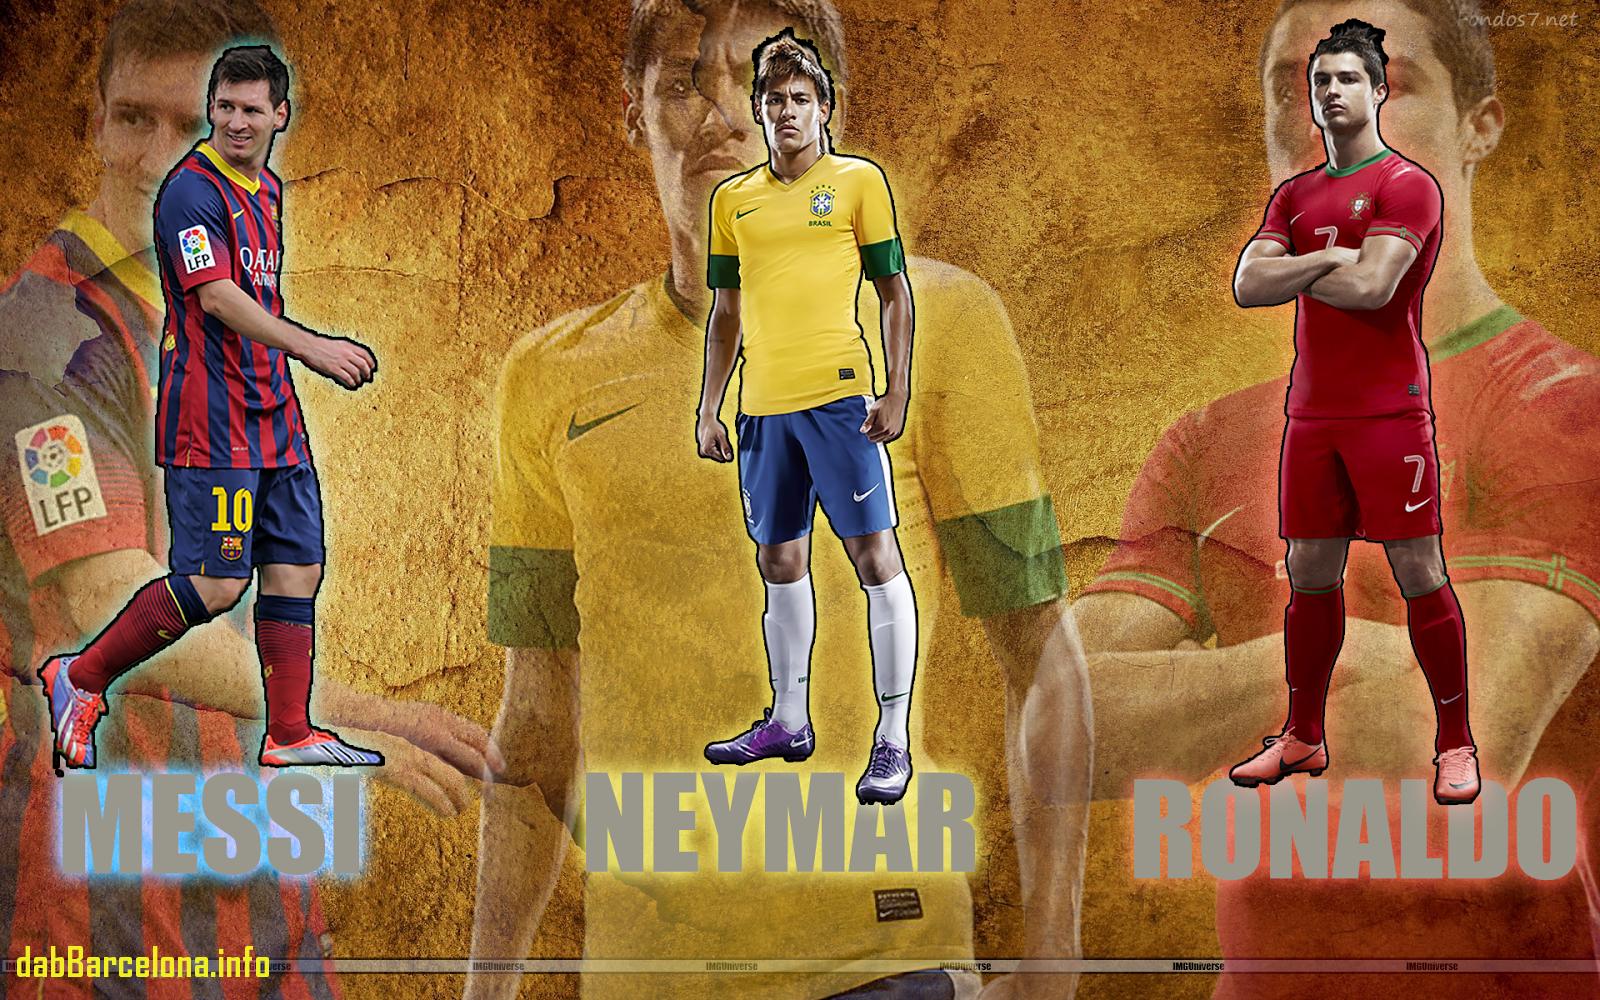 Messi - Ronaldo Vs Messi Vs Neymar Wallpaper 2018 , HD Wallpaper & Backgrounds